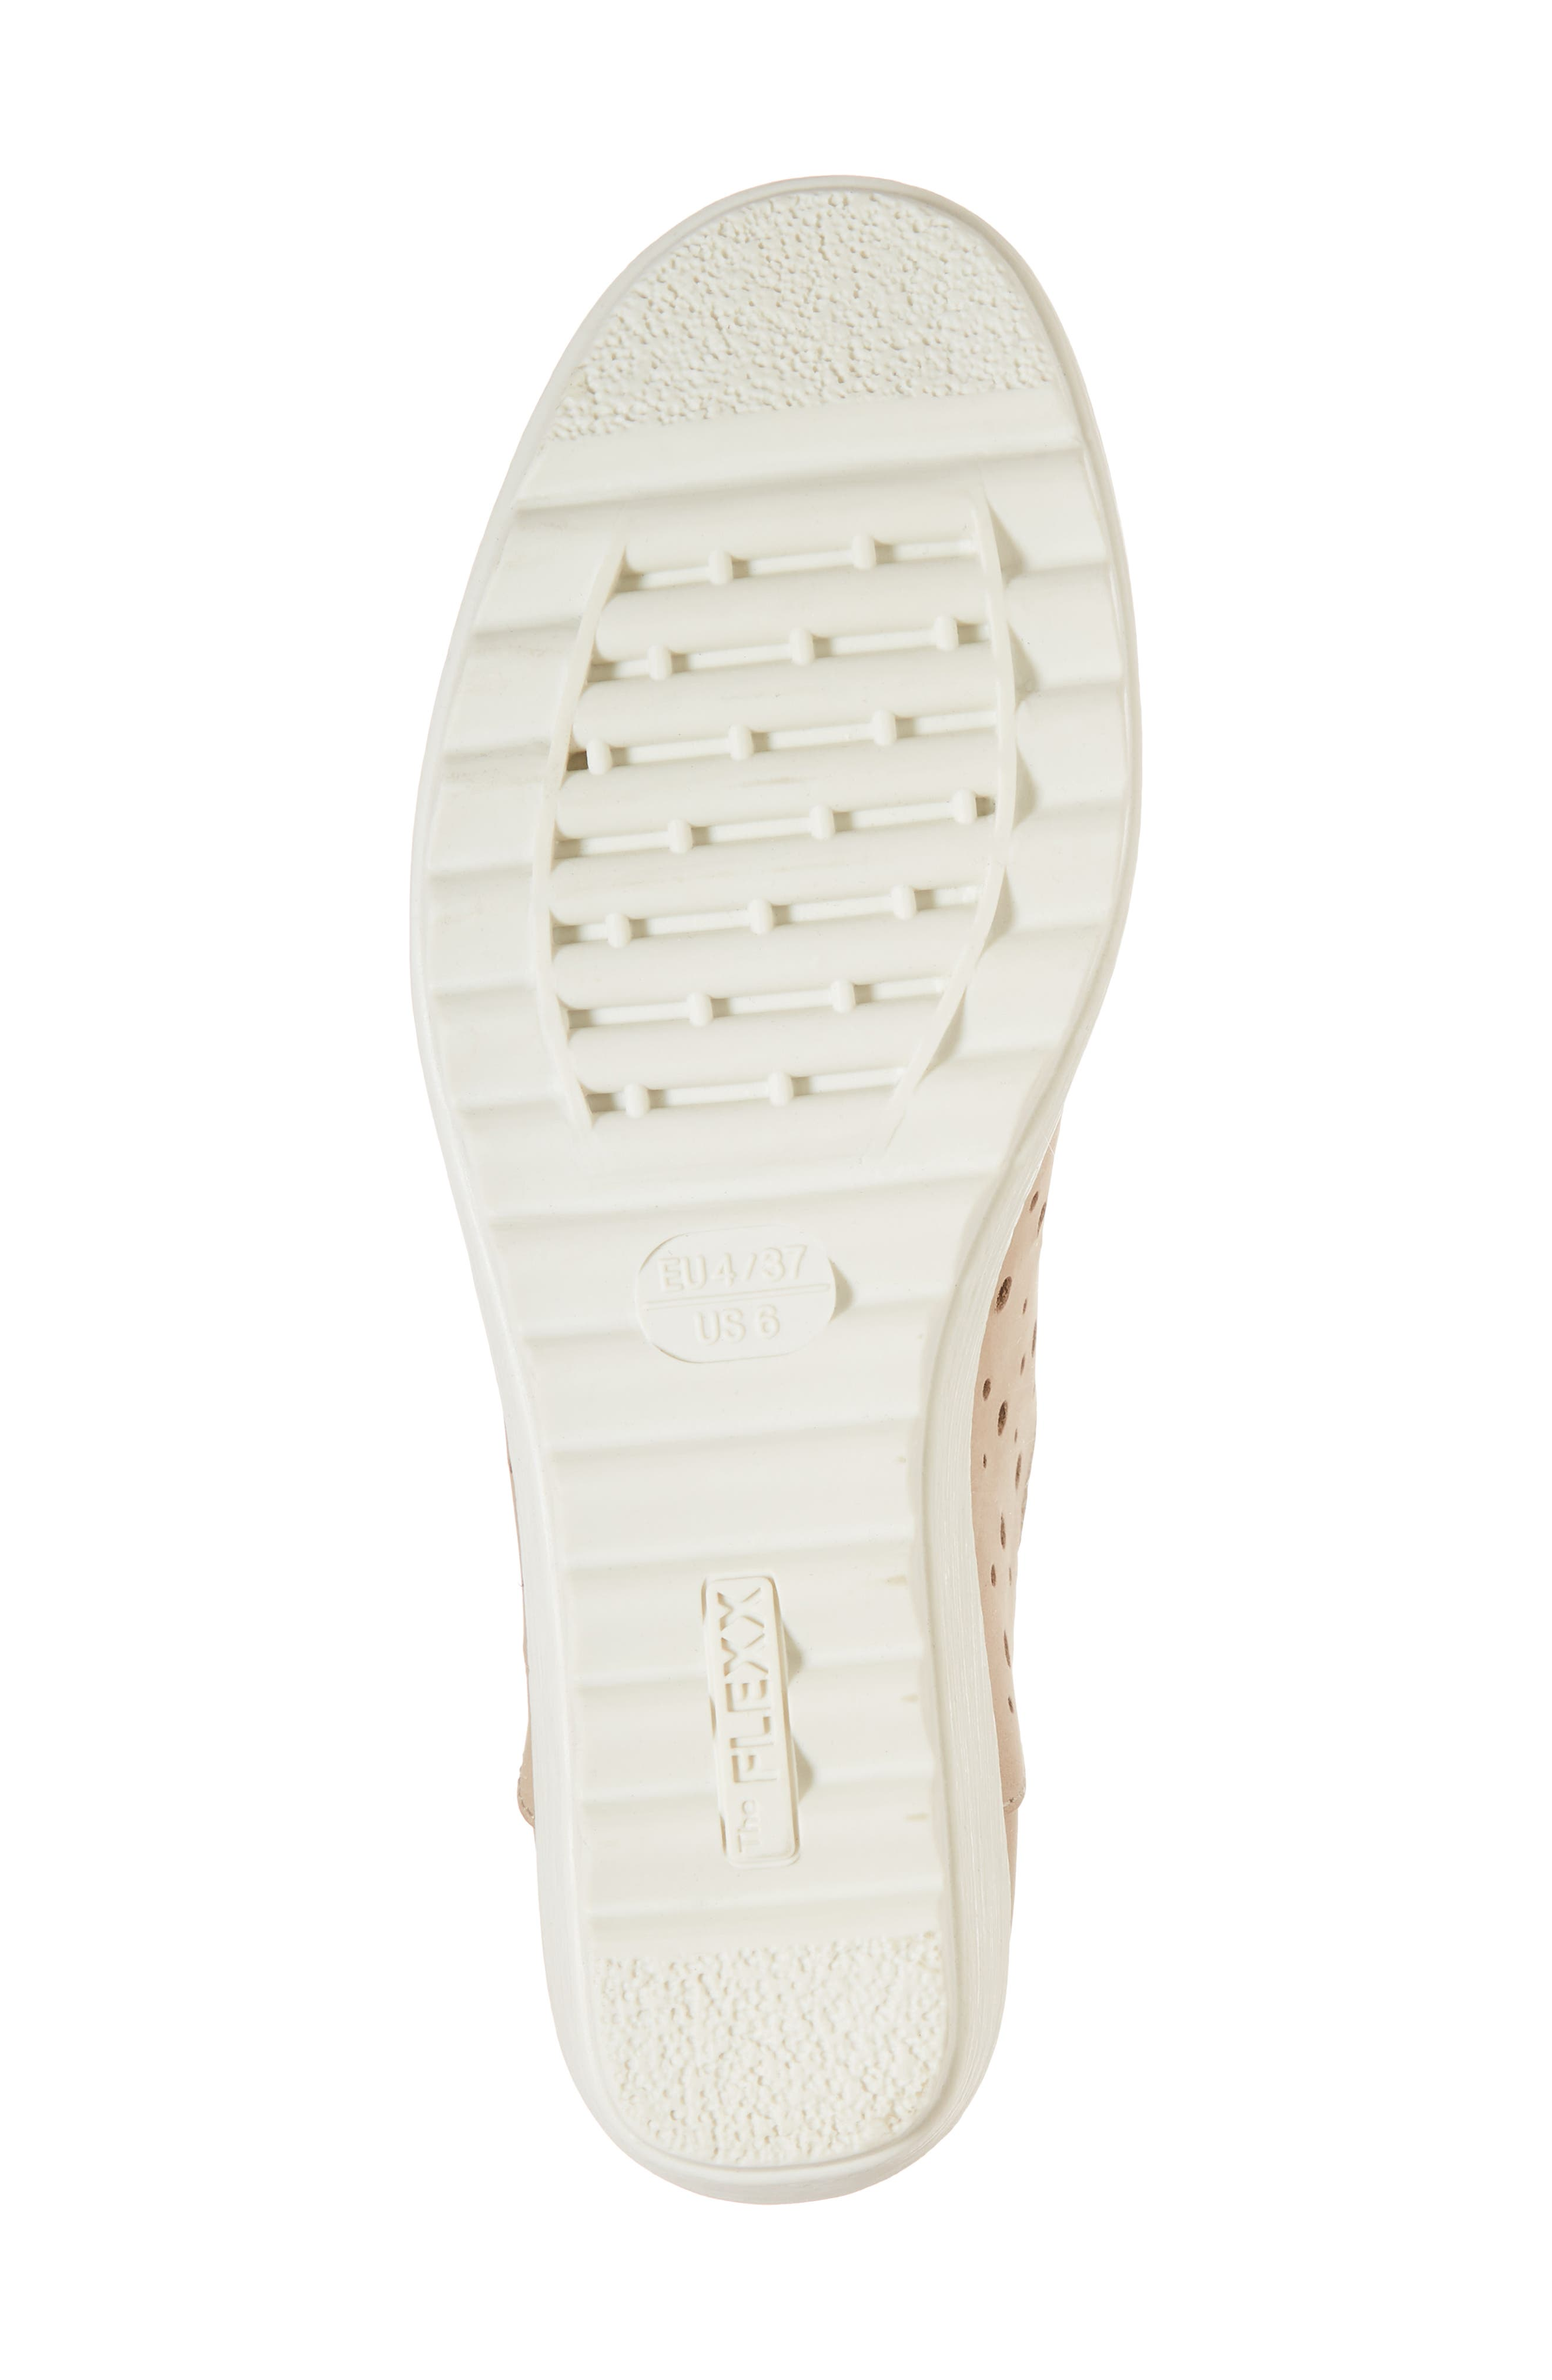 Run Crazy Too Perforated Wedge Sneaker,                             Alternate thumbnail 6, color,                             Dune Nubuck